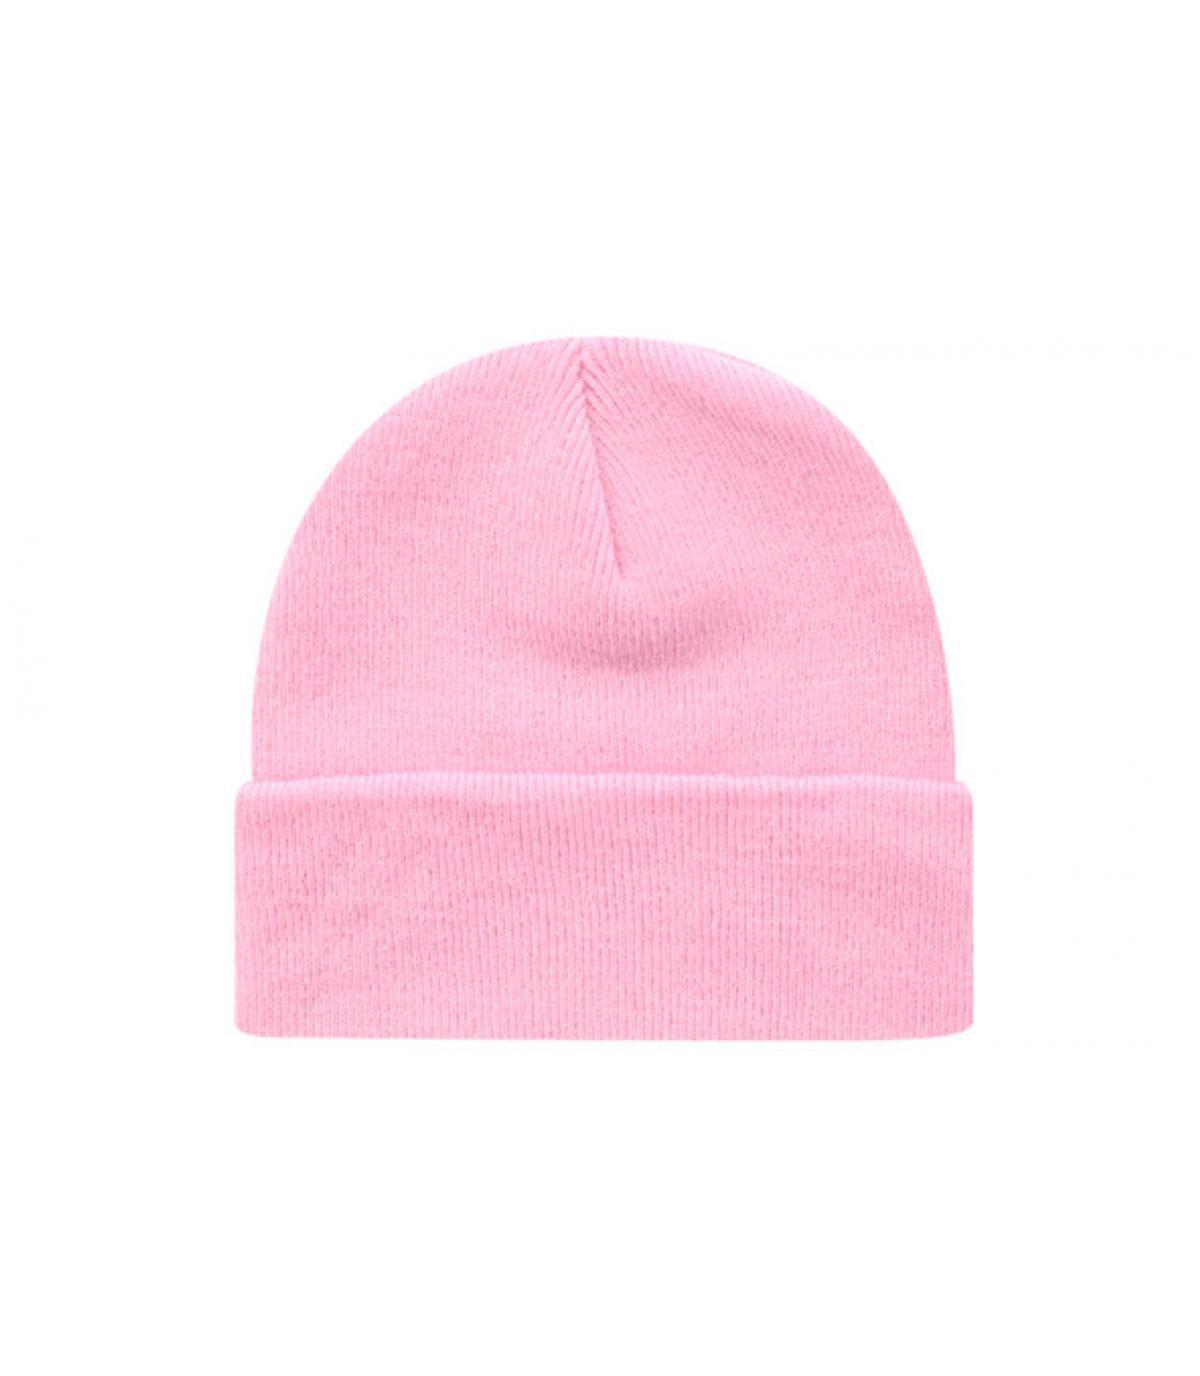 Beanie blank pink